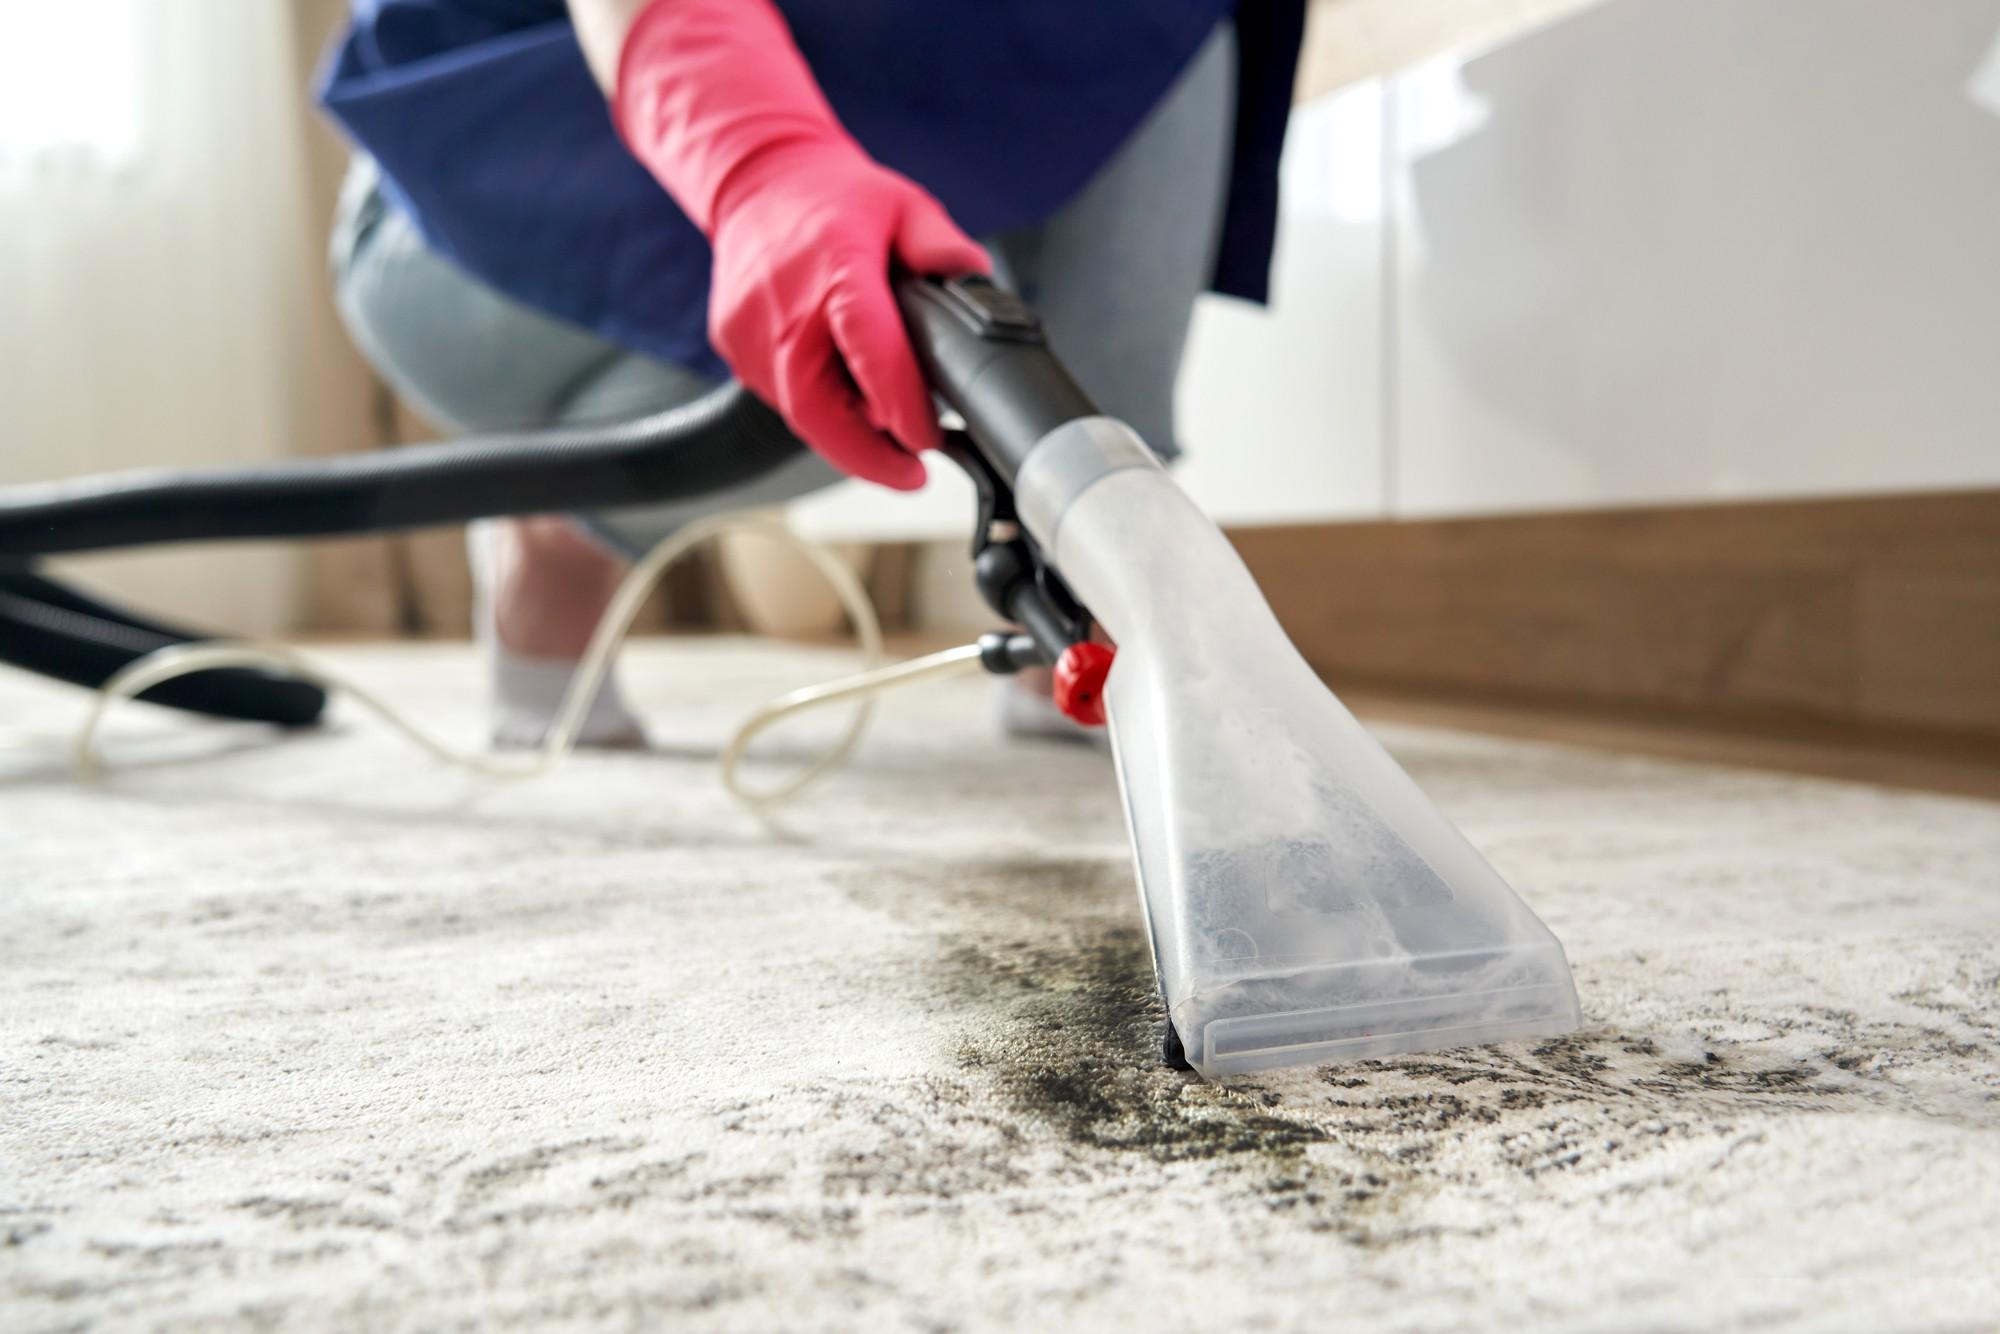 Person using wet vacuum to clean carpet